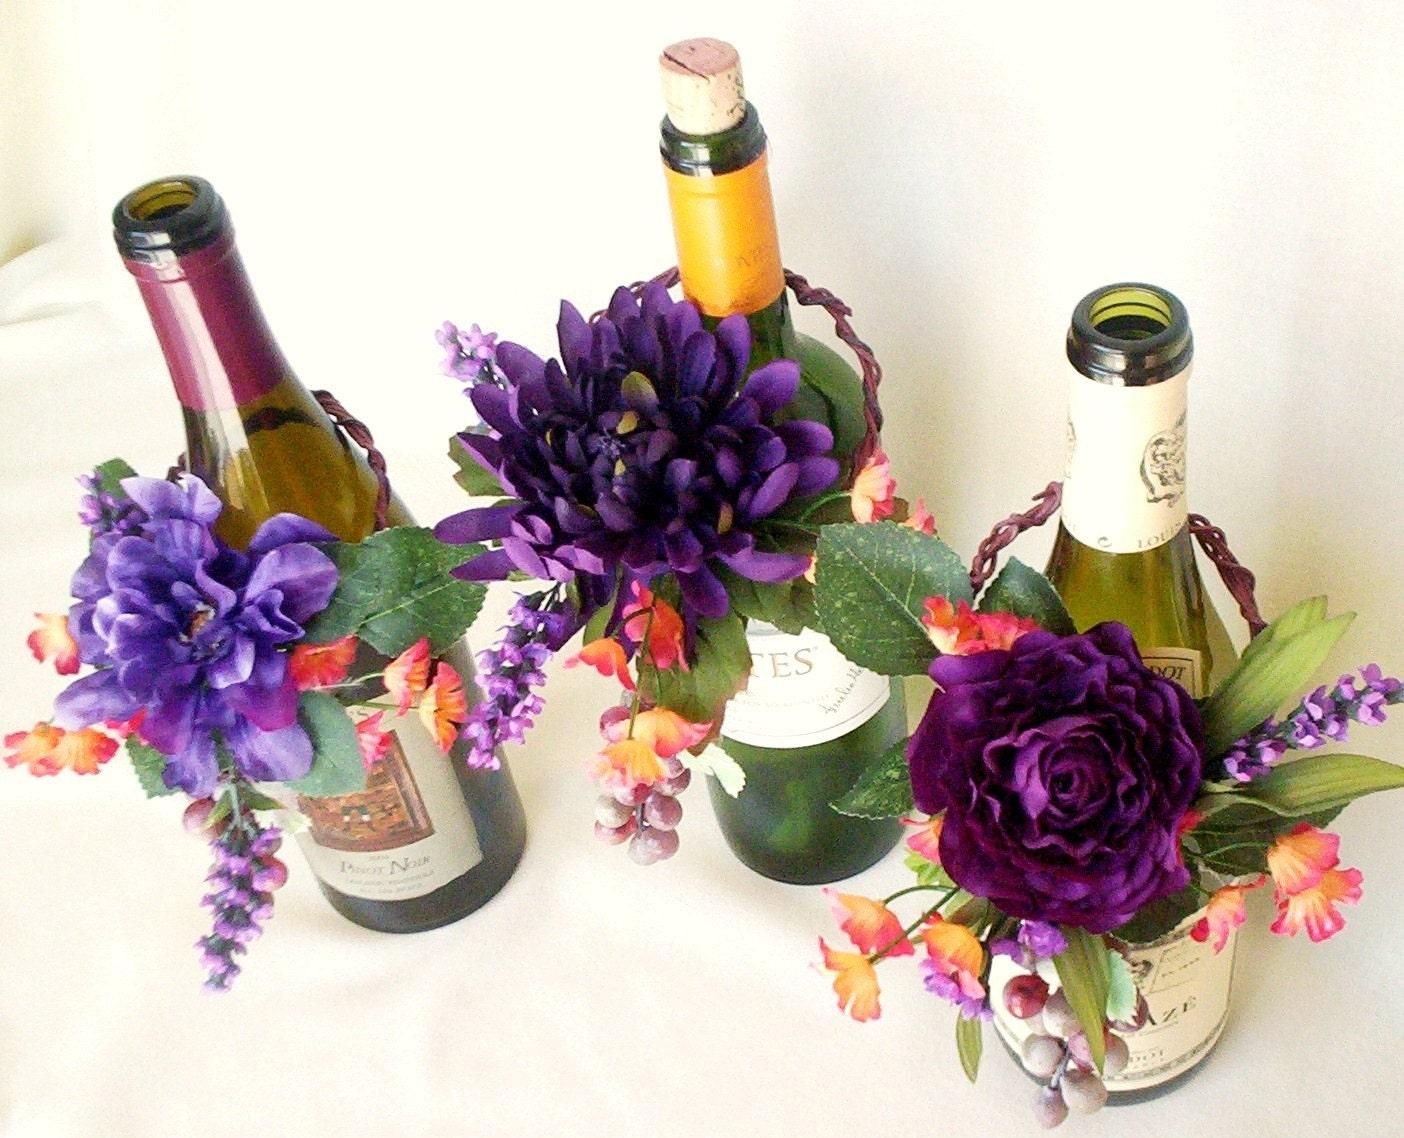 weddings wine bottle toppers vineyard weddingcenterpieces. Black Bedroom Furniture Sets. Home Design Ideas